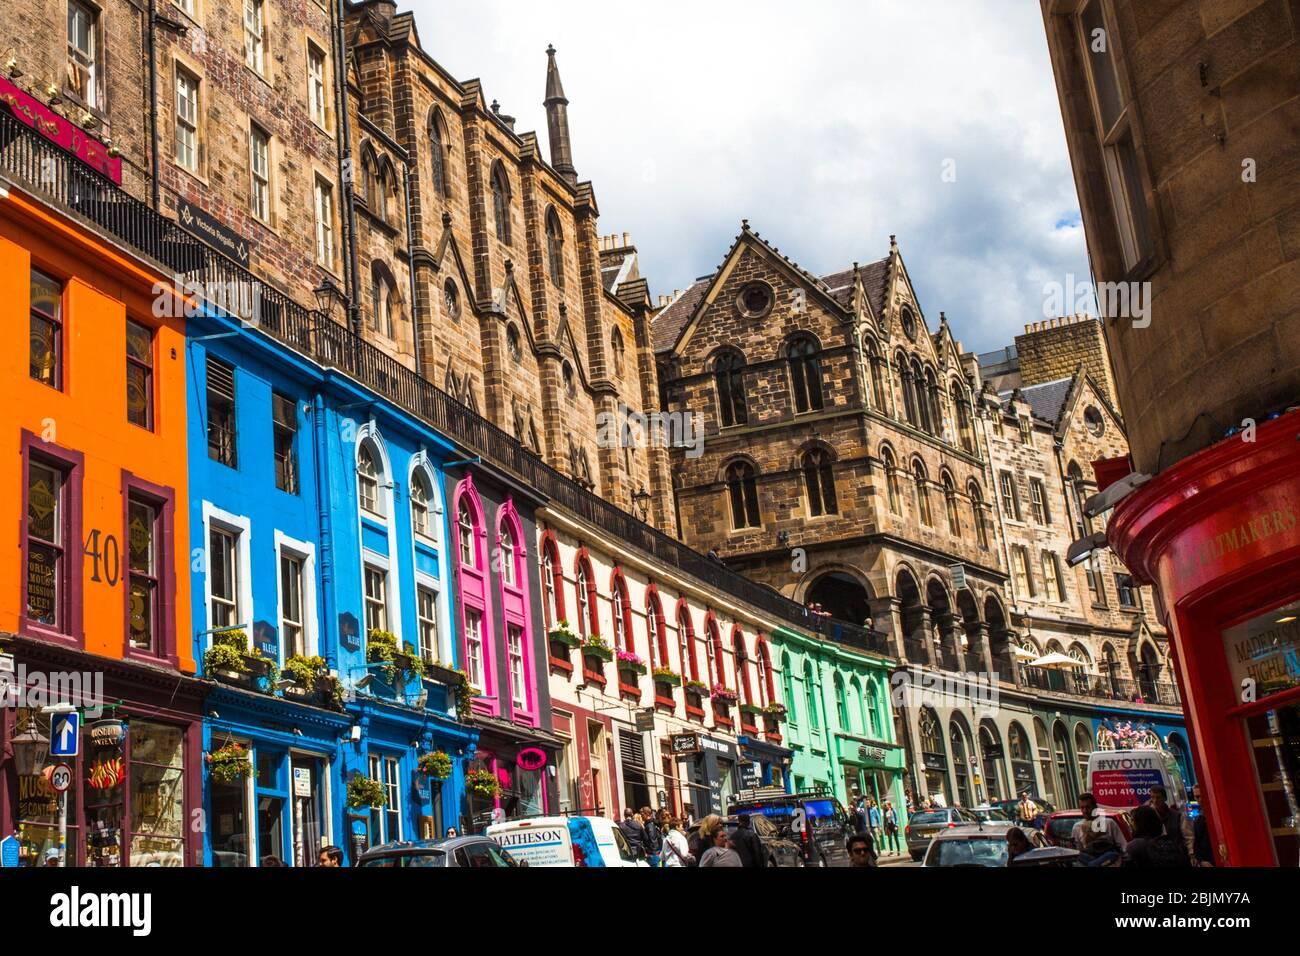 Victoria Street, Old Town, Edinburgh, Scotland, United Kingdom, Europe. Stock Photo